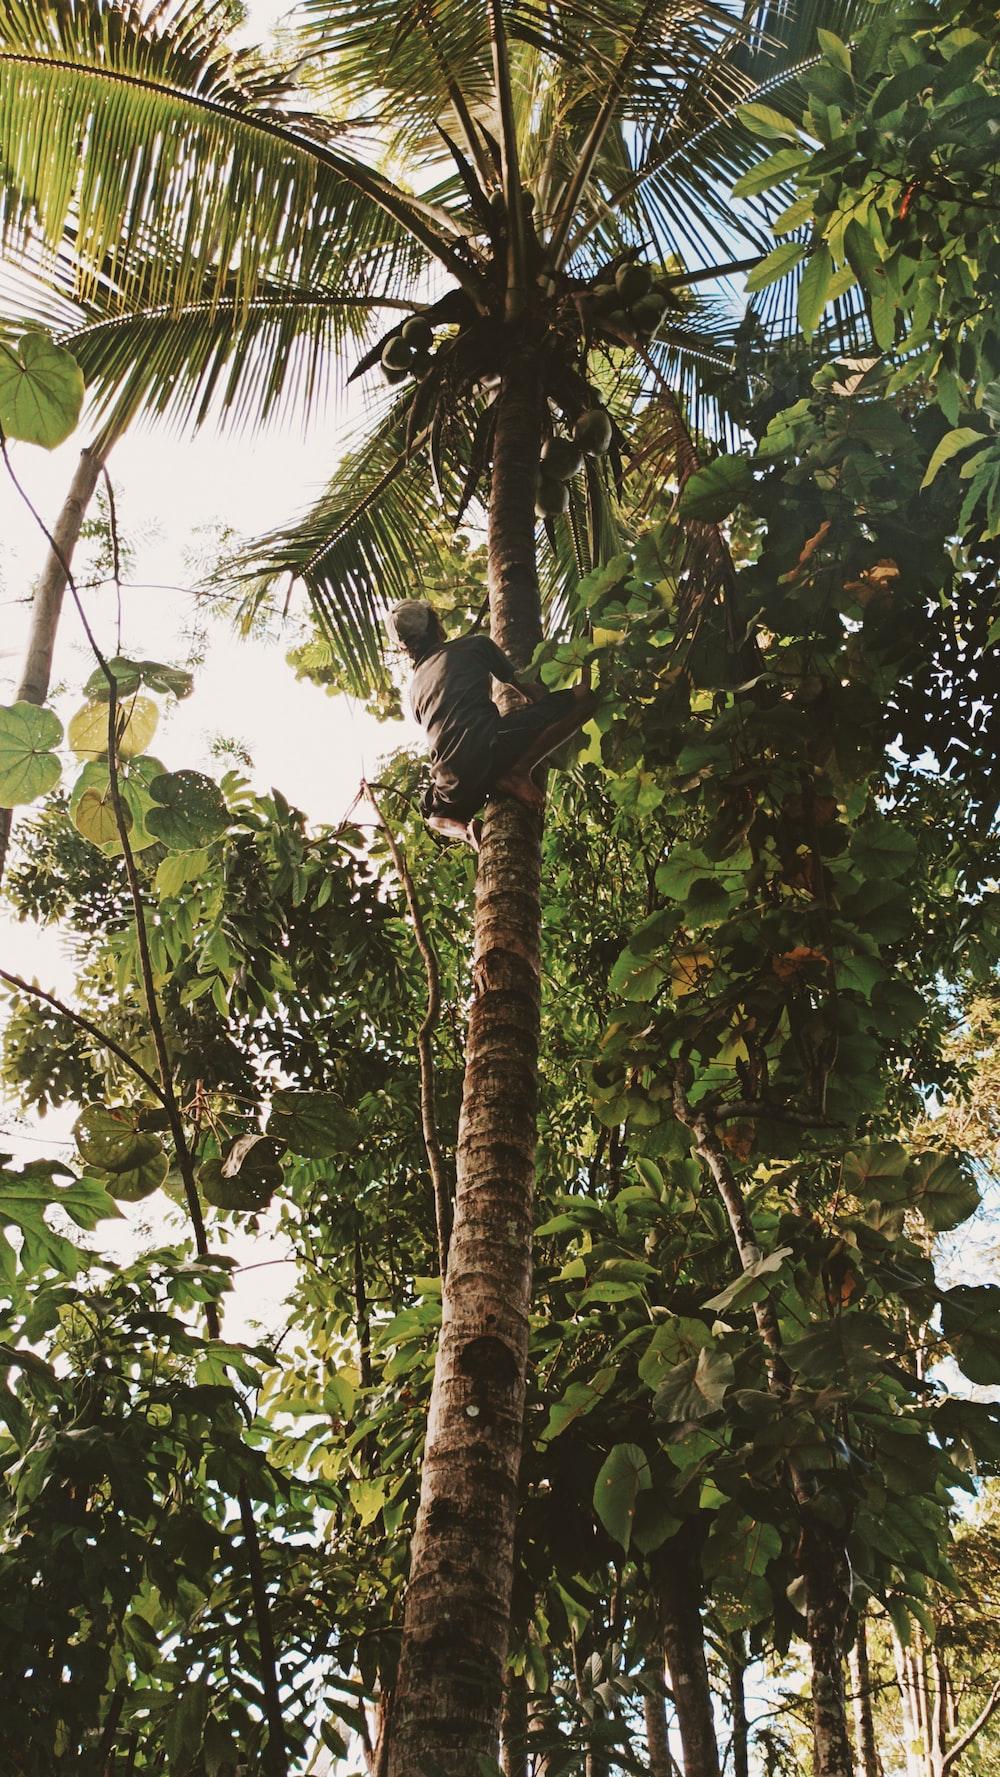 black bird on brown tree branch during daytime